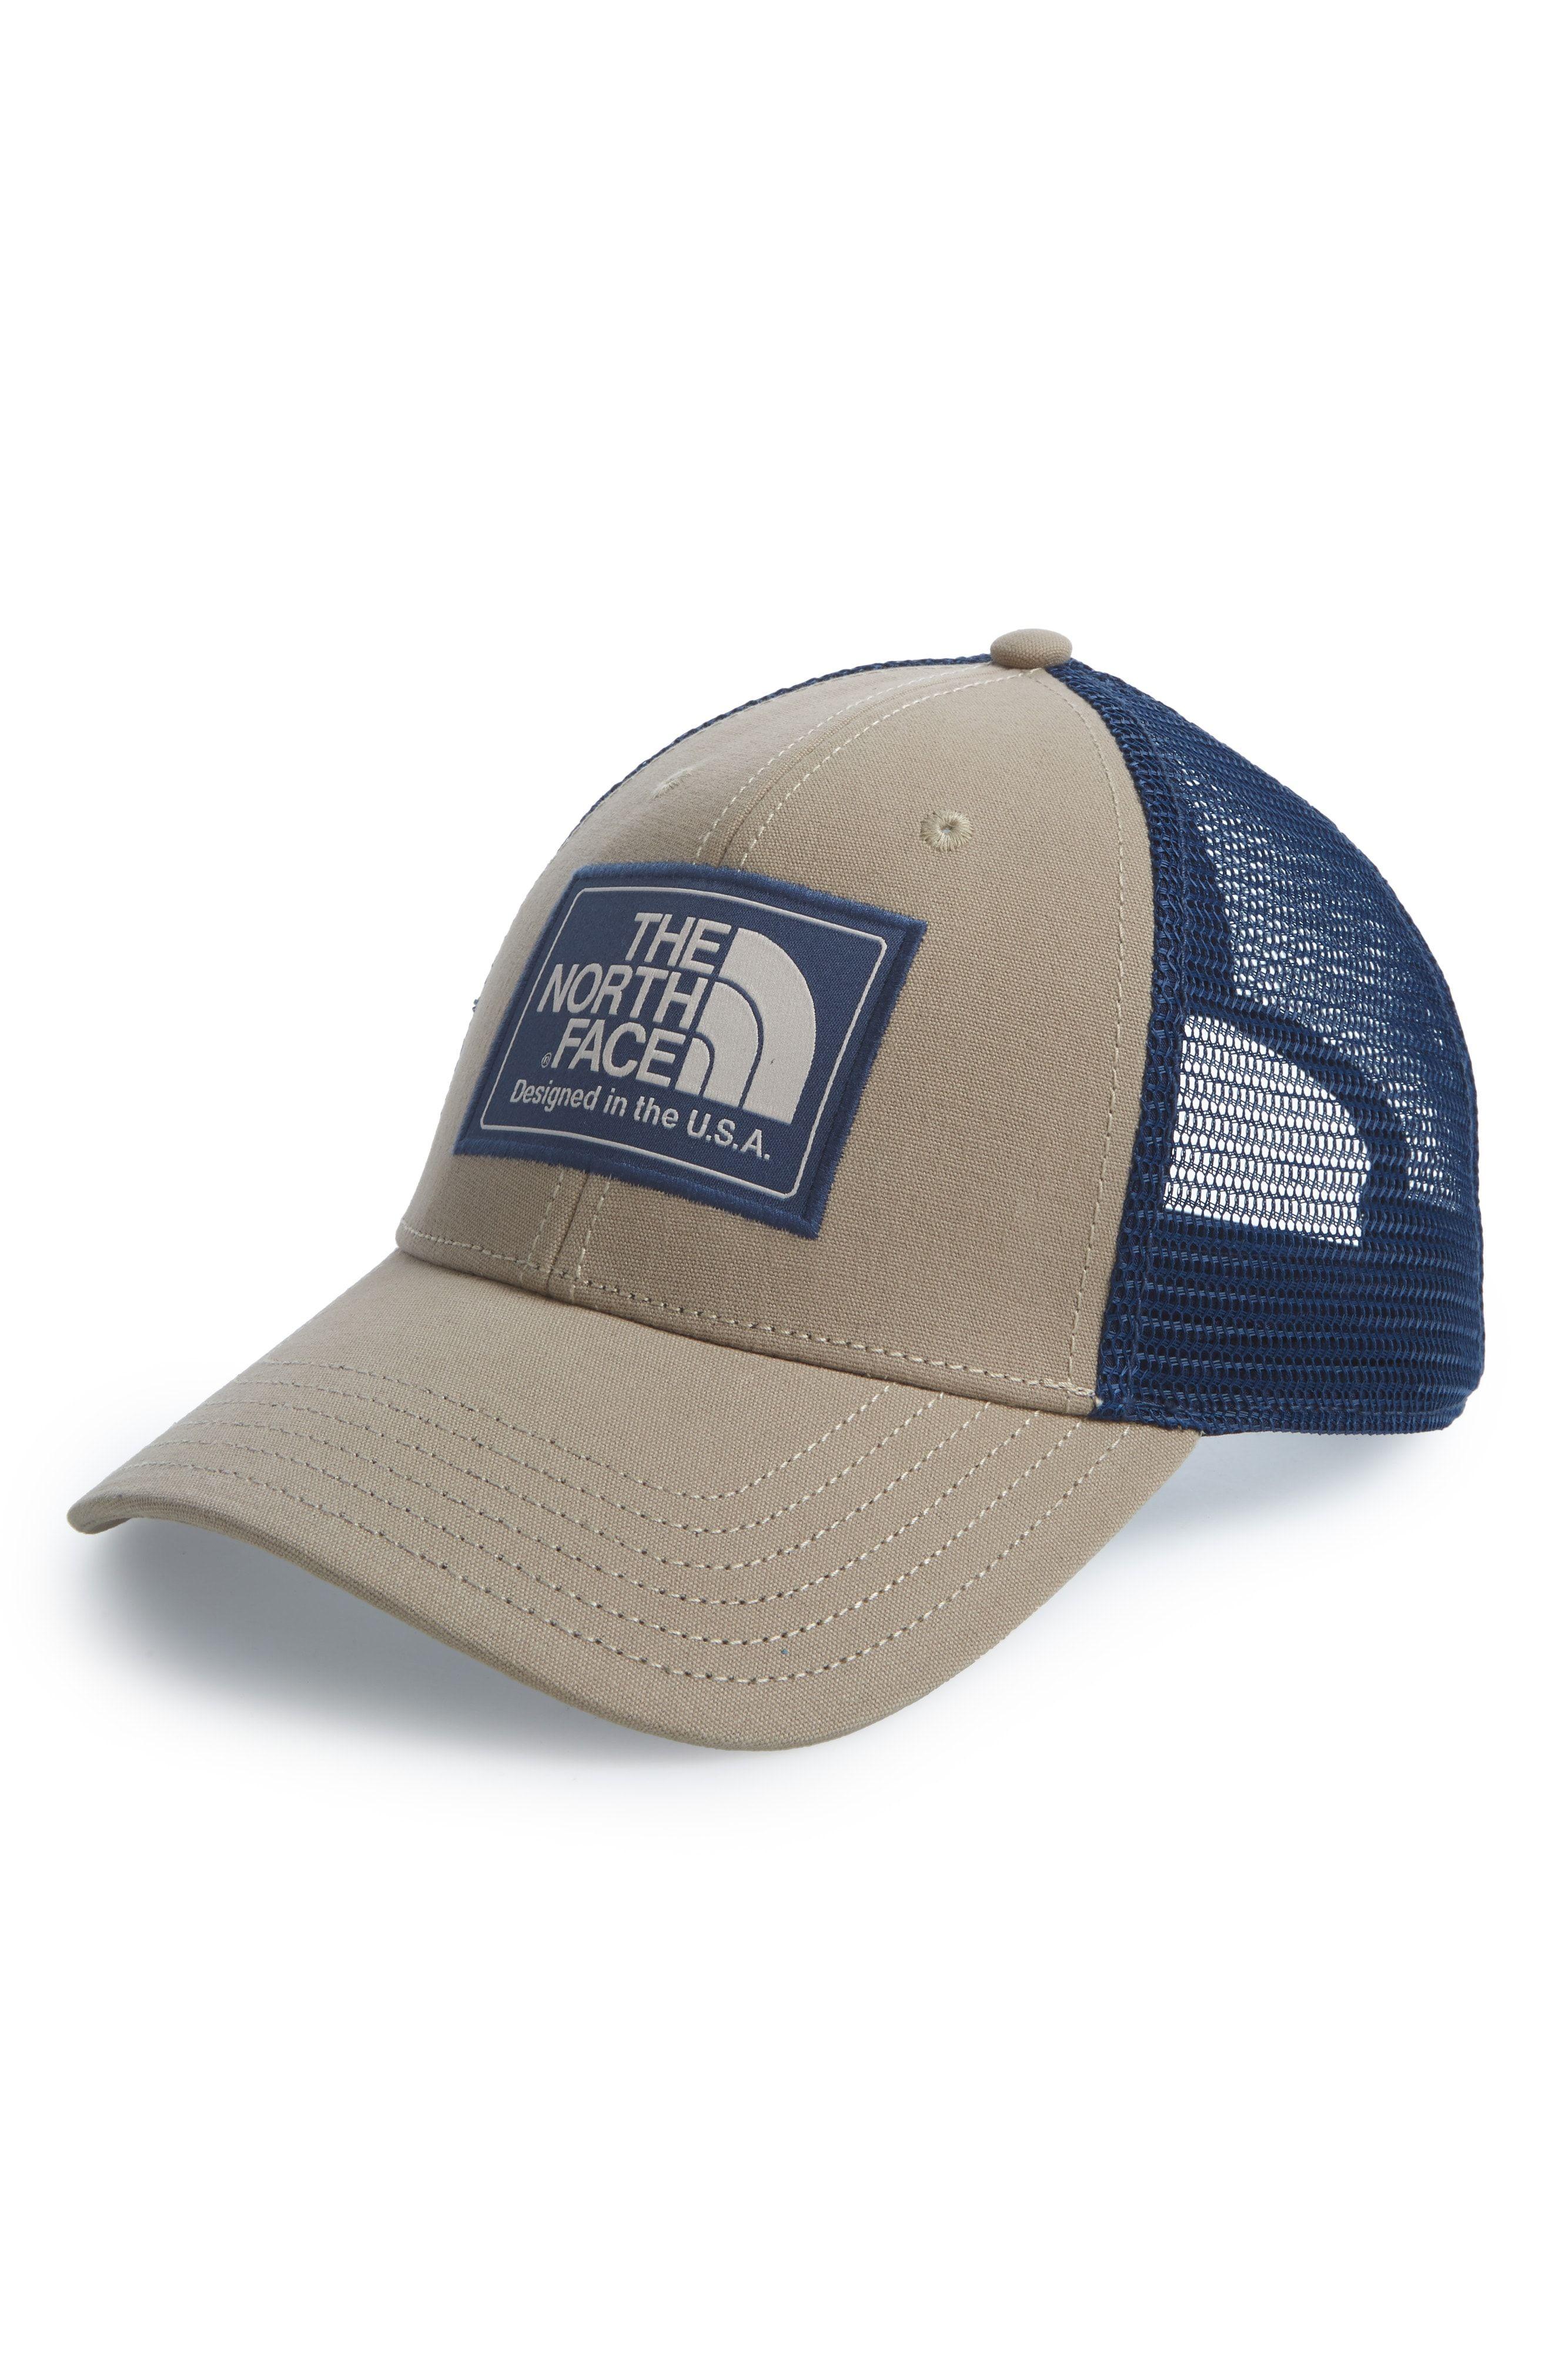 355c0c680 THE NORTH FACE MUDDER TRUCKER HAT - BEIGE. #thenorthface | The North ...